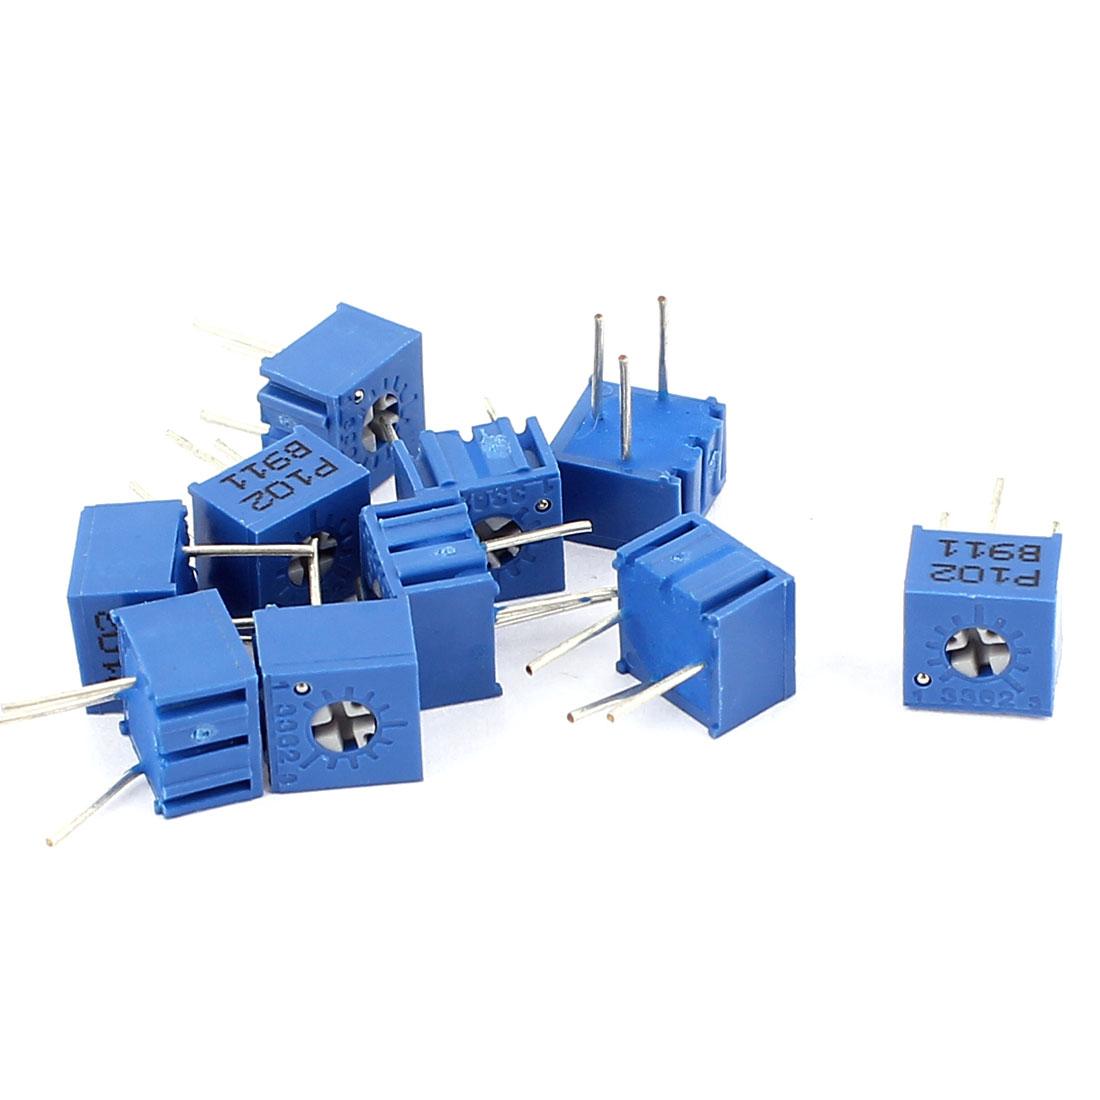 10Pcs Adjustable Potentiometer Trimmer Variable Resistor 3362P-102 10K Ohm